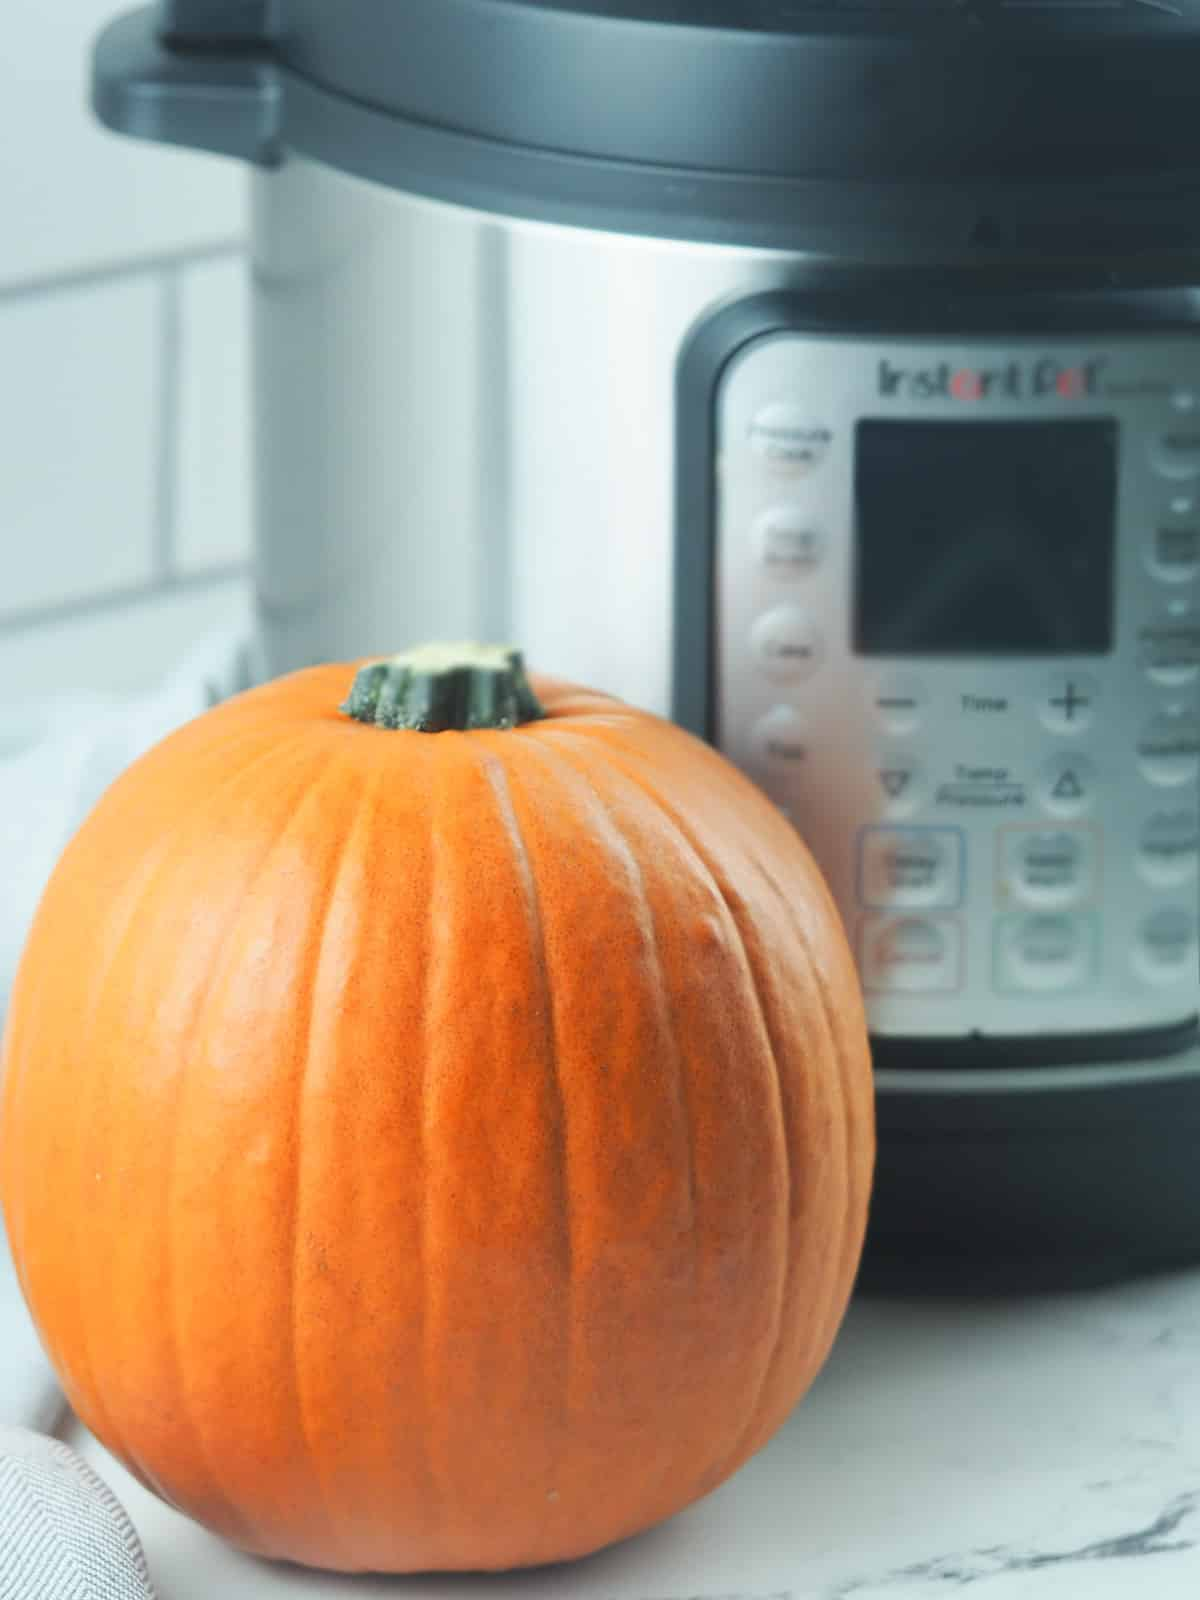 pie pumpkin sitting next to an instant pot